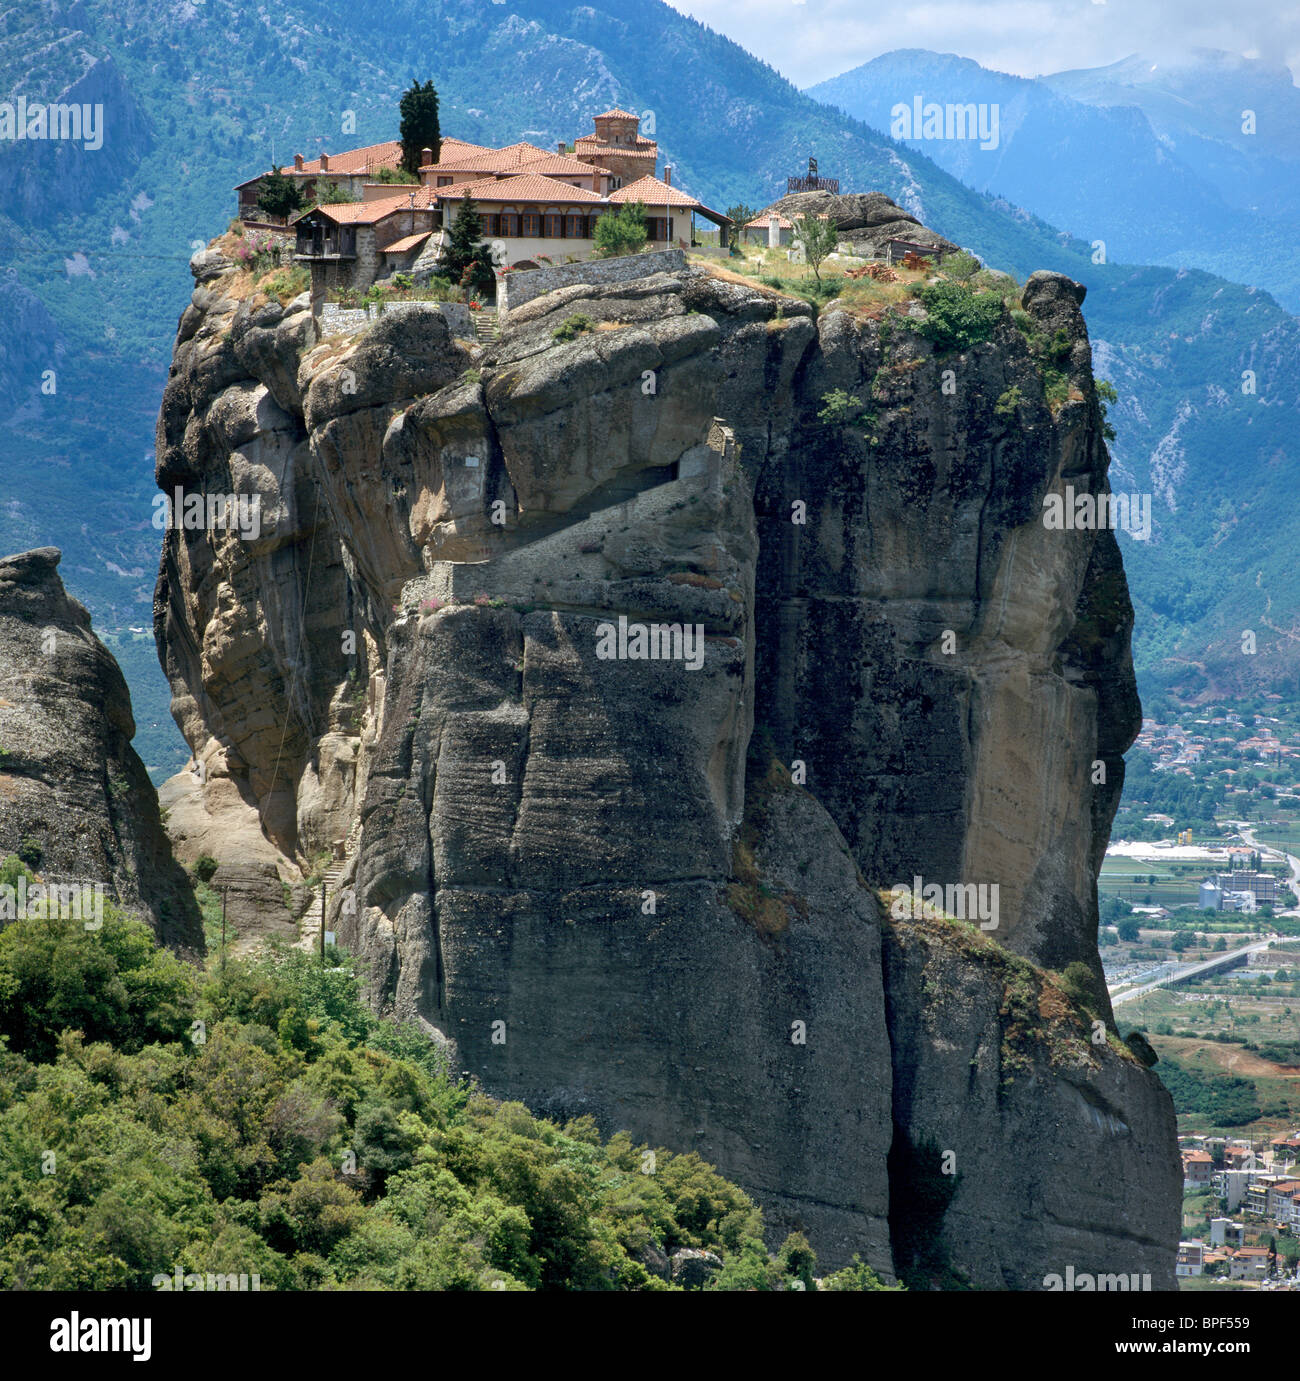 Agia Triada Monastery, Monasteries of Meteora, Thessalia, Greek Mainland, Greece - Stock Image